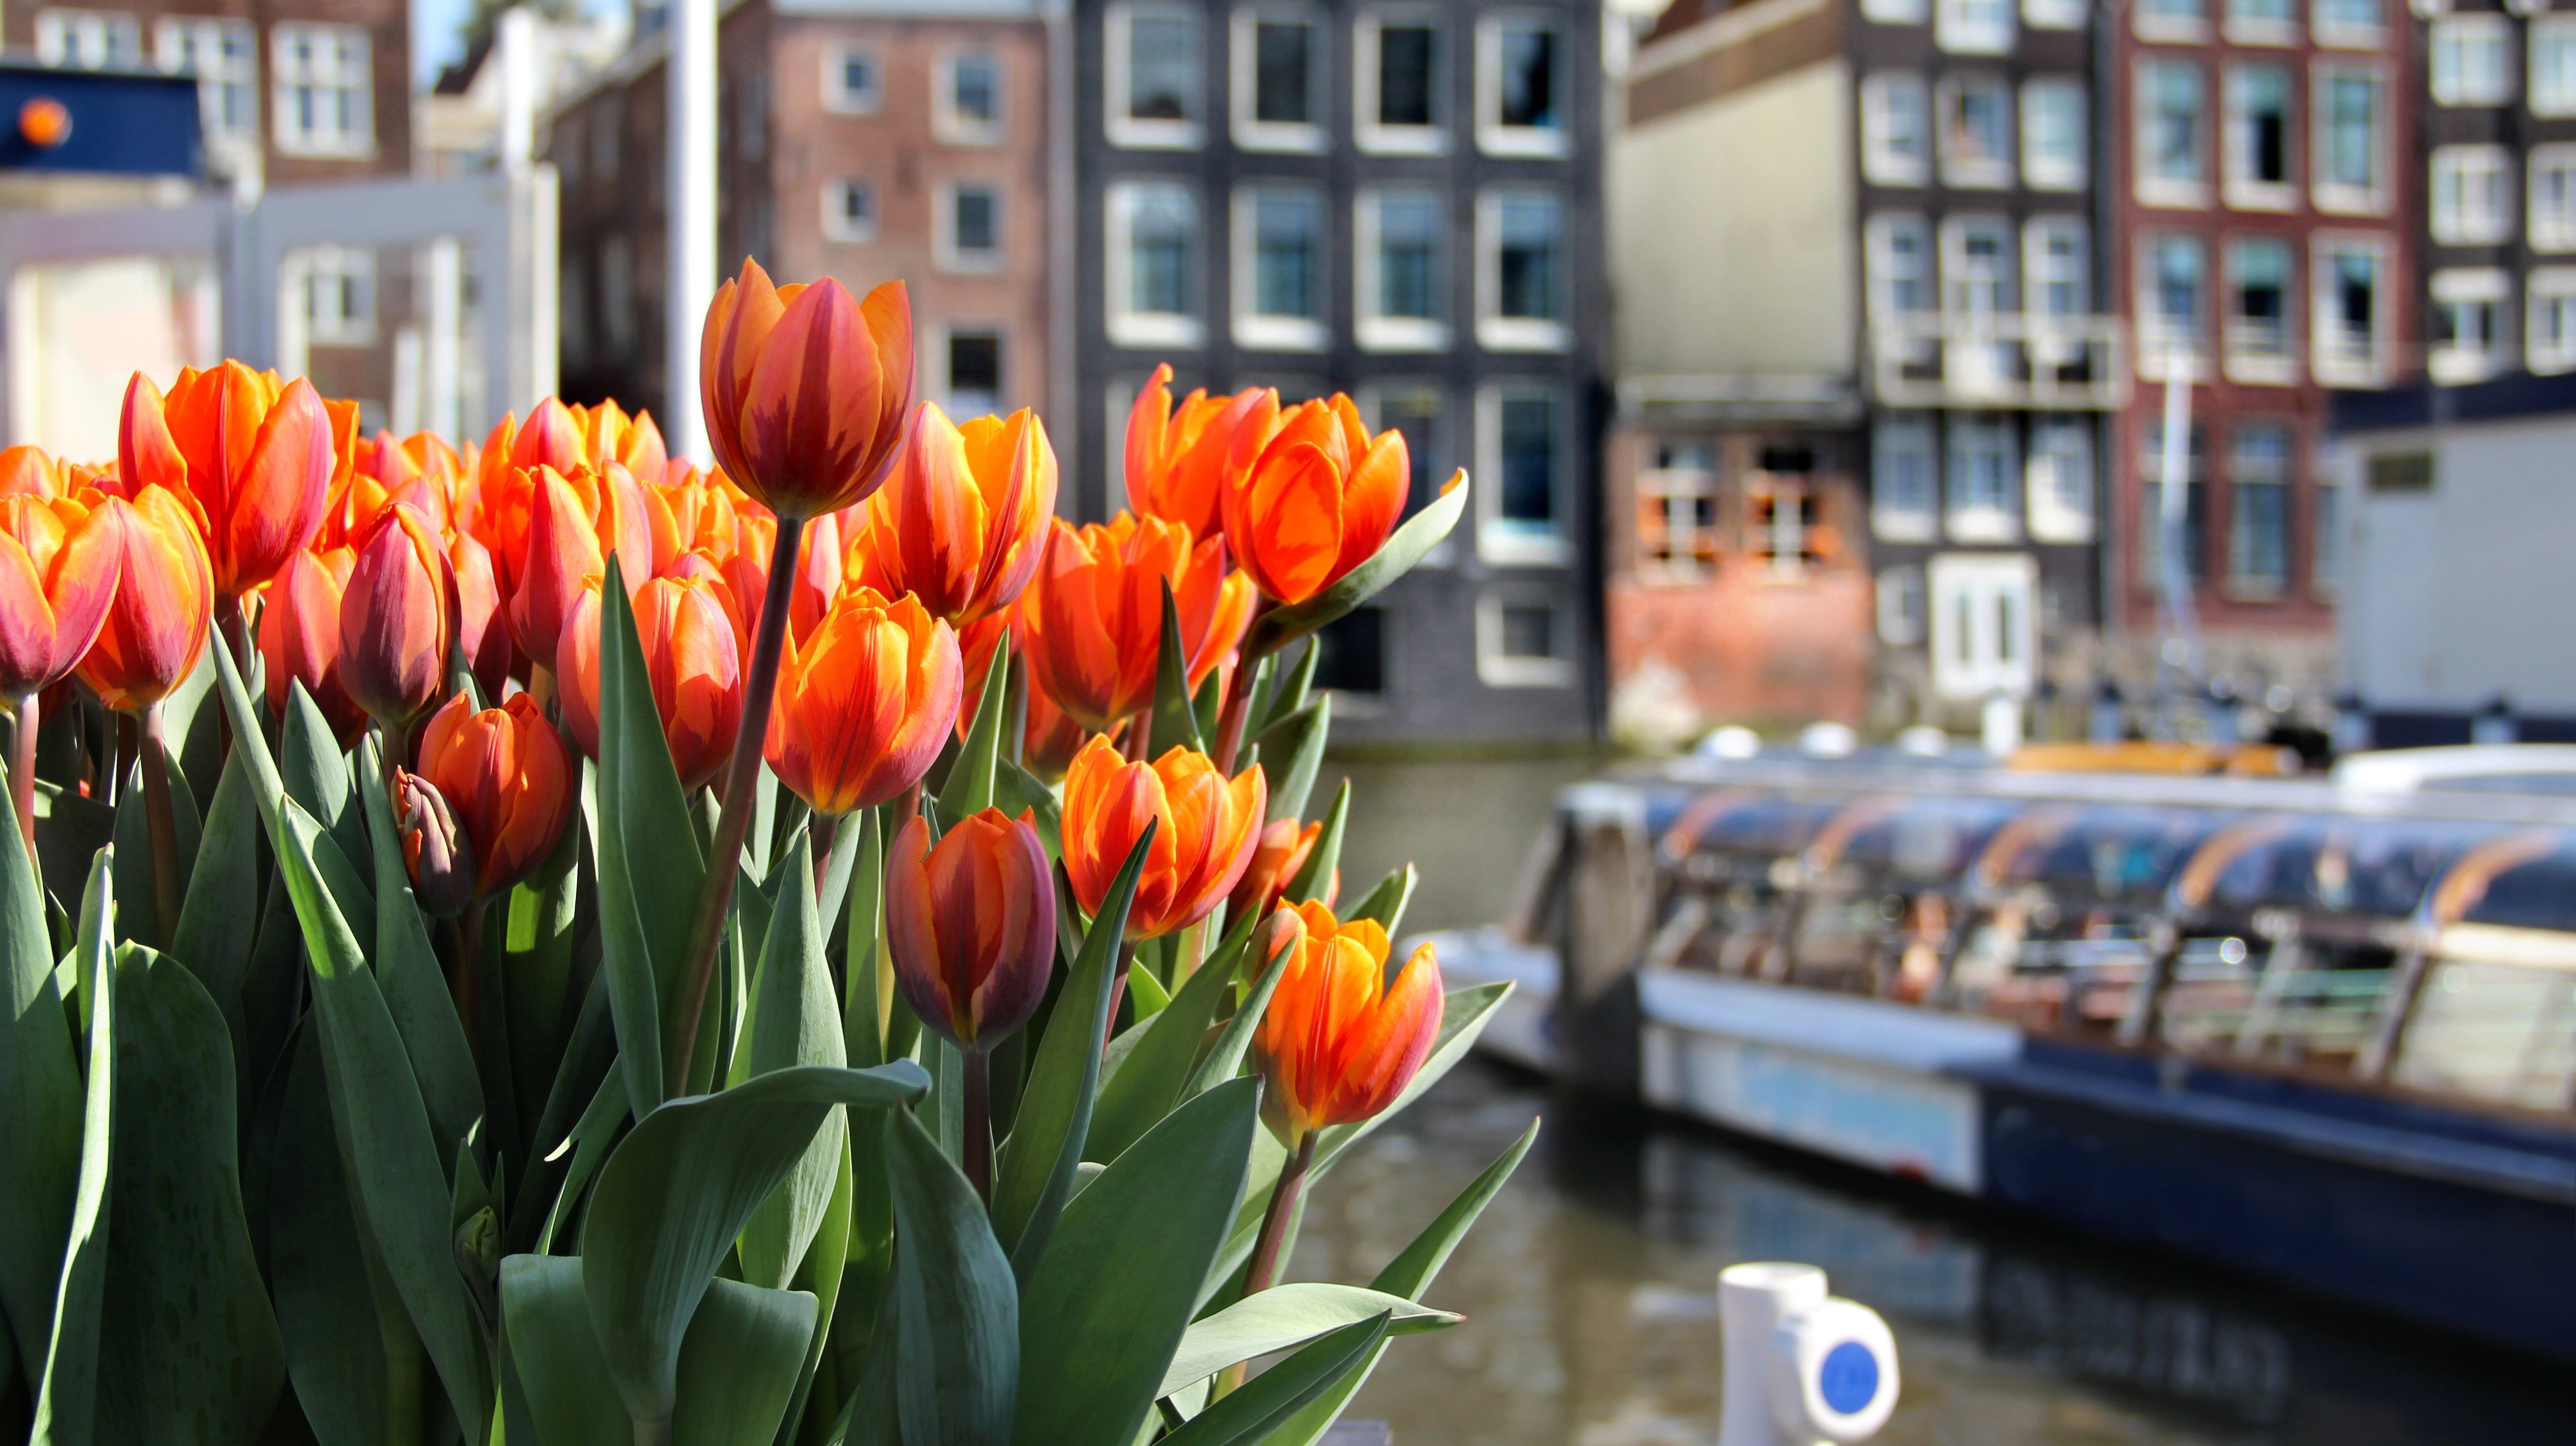 Paket Tour Eropa Barat Wisata Muslim Maret 13 Hari 12 Malam Musim Semi (Spring)